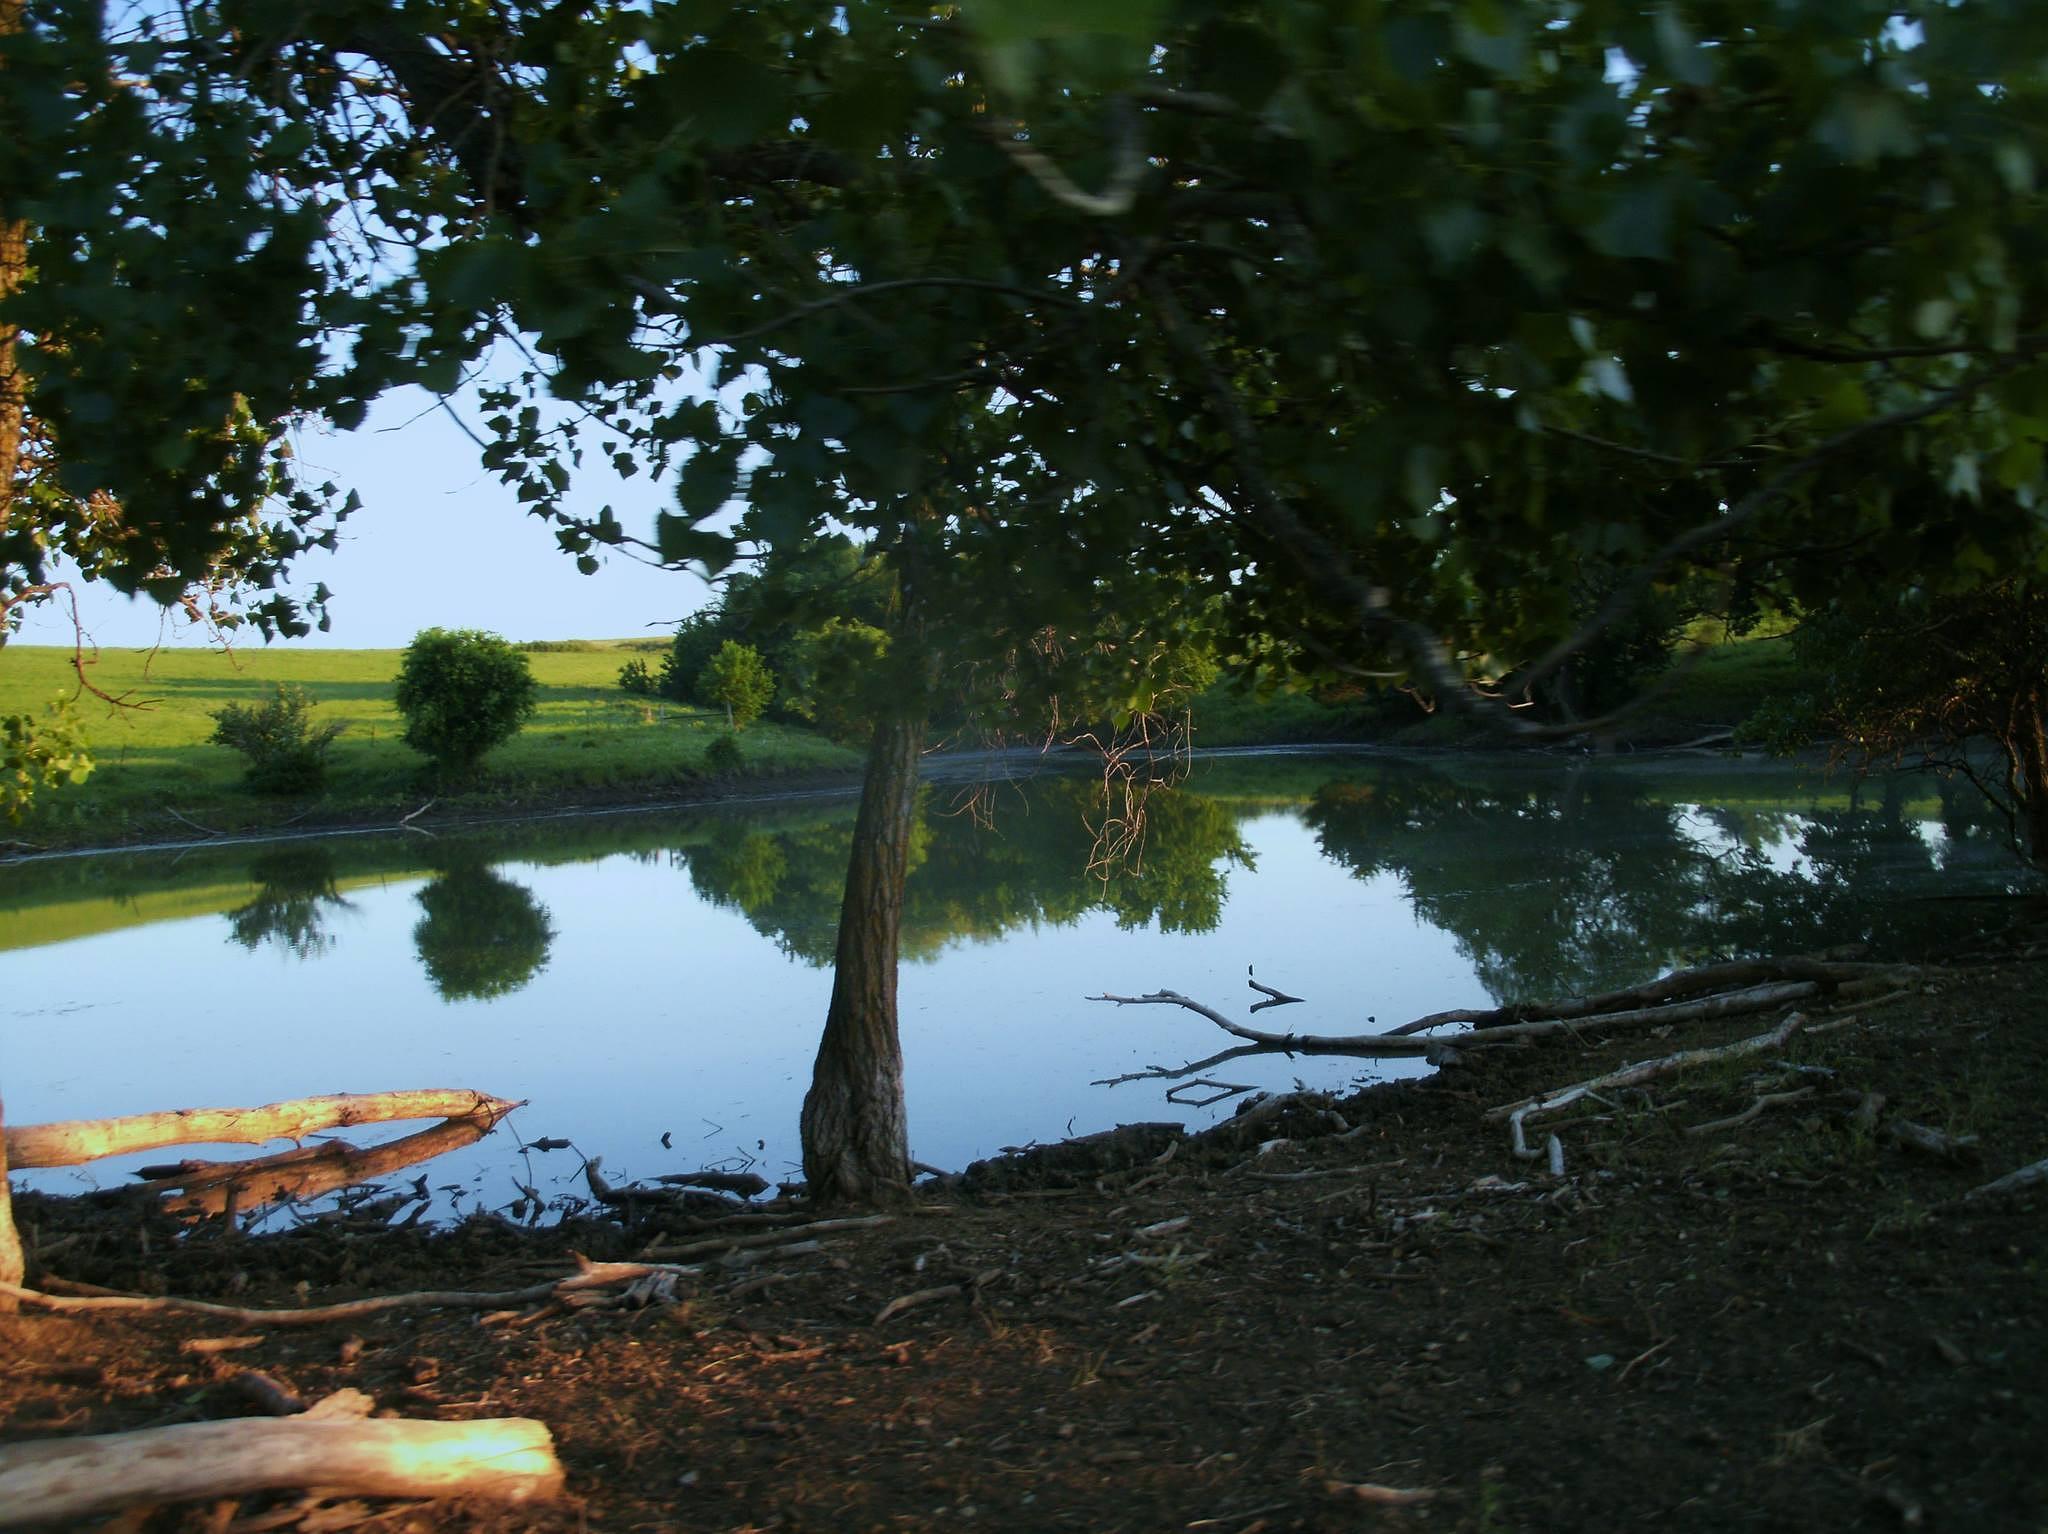 Country pond by Marsha Furman